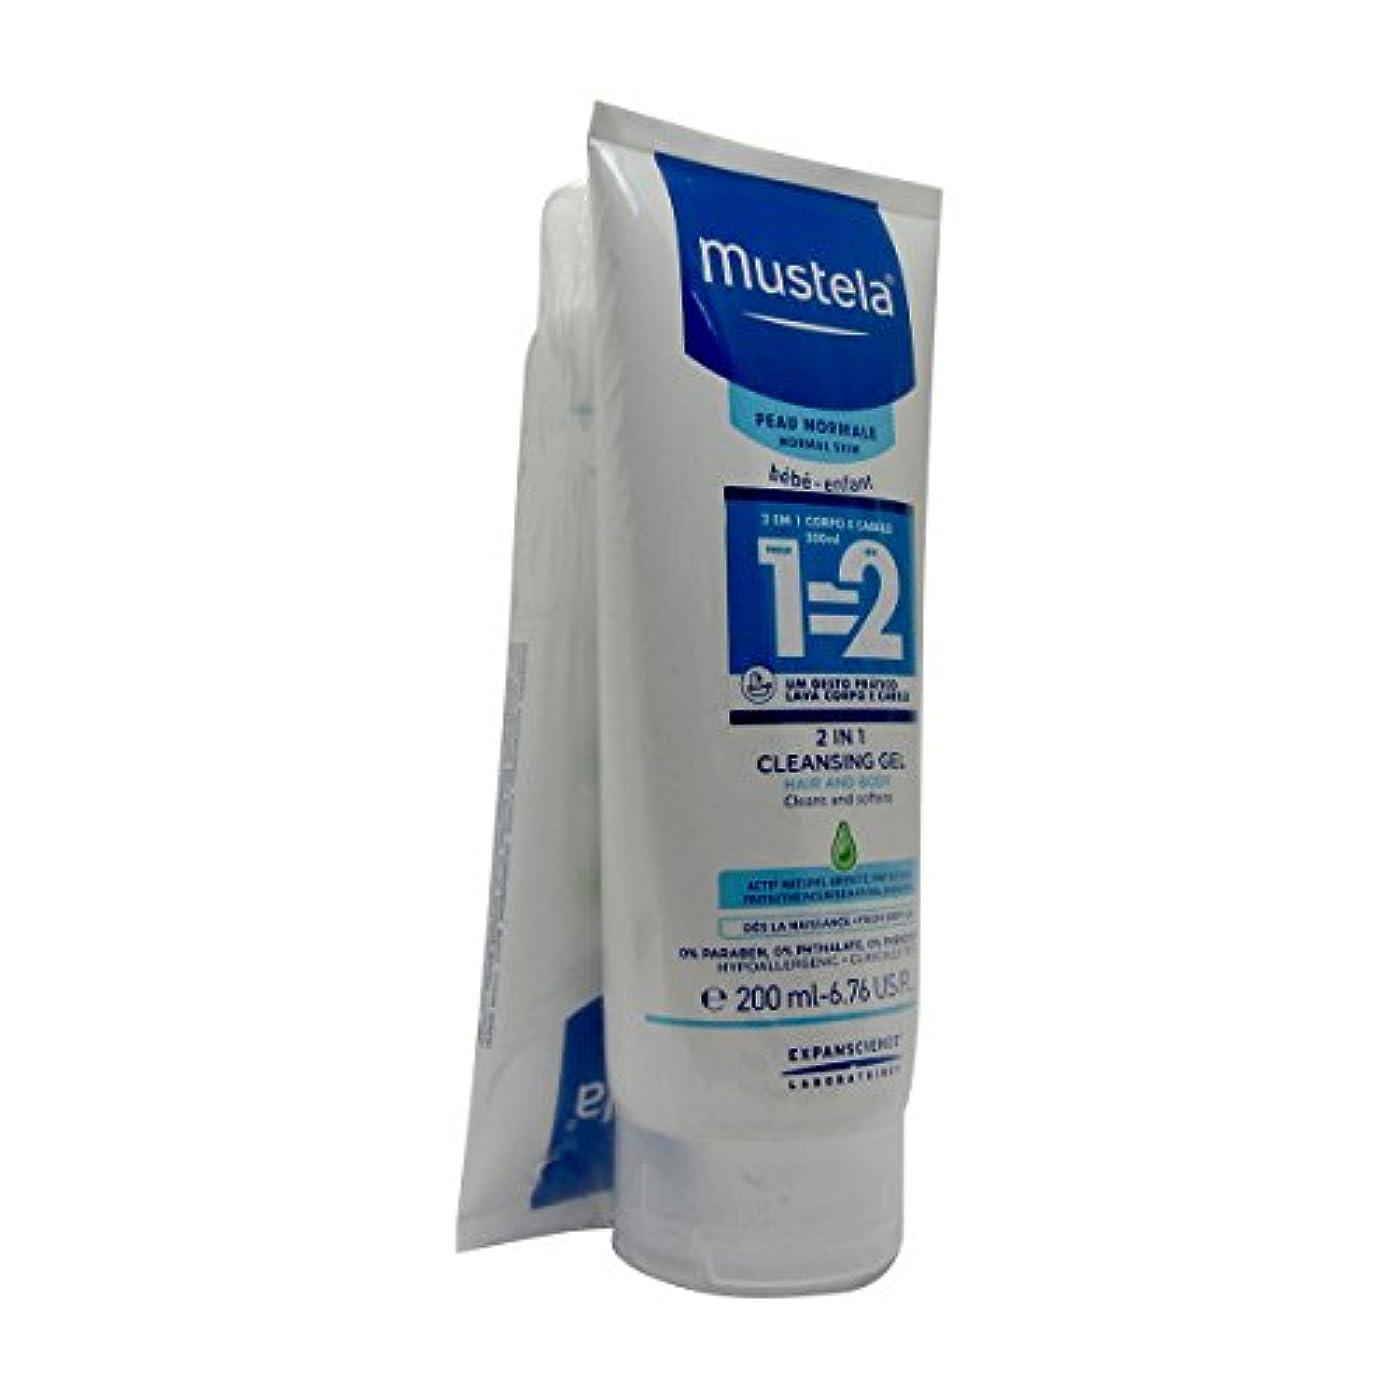 Mustela Pack Champo 2 In 1 2x200ml [並行輸入品]